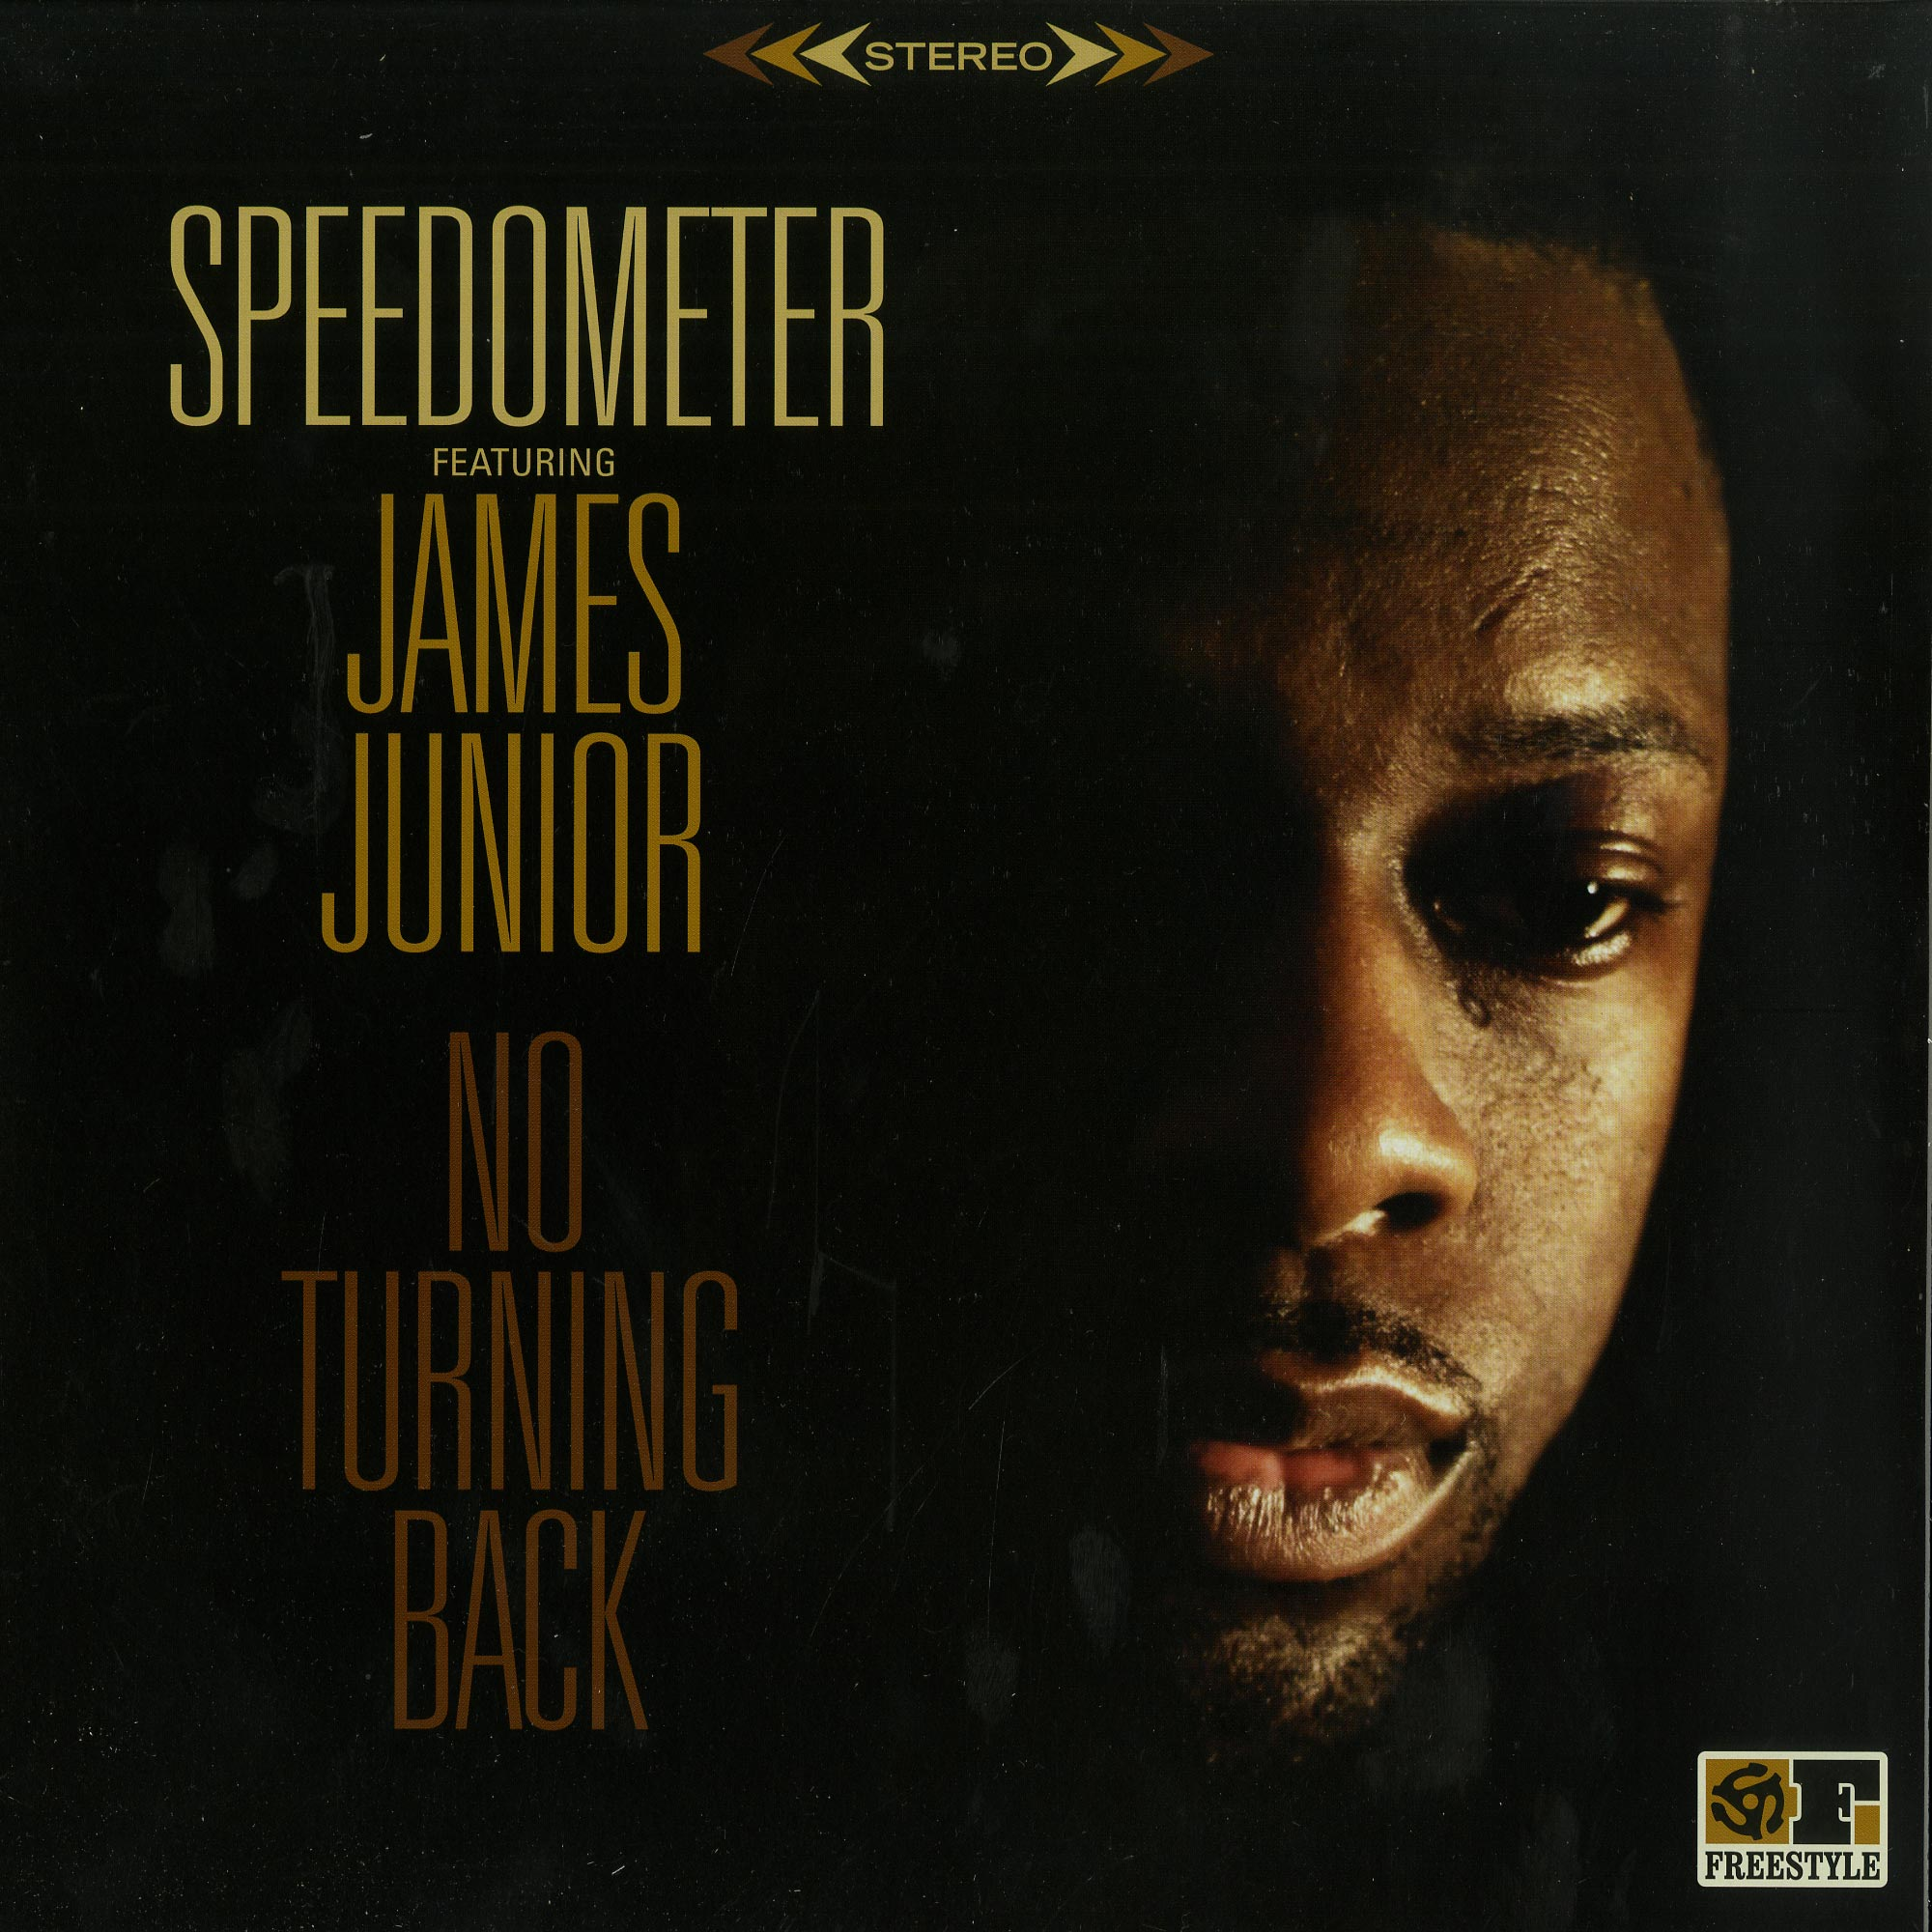 Speedometer ft. James Junior - NO TURNING BACK